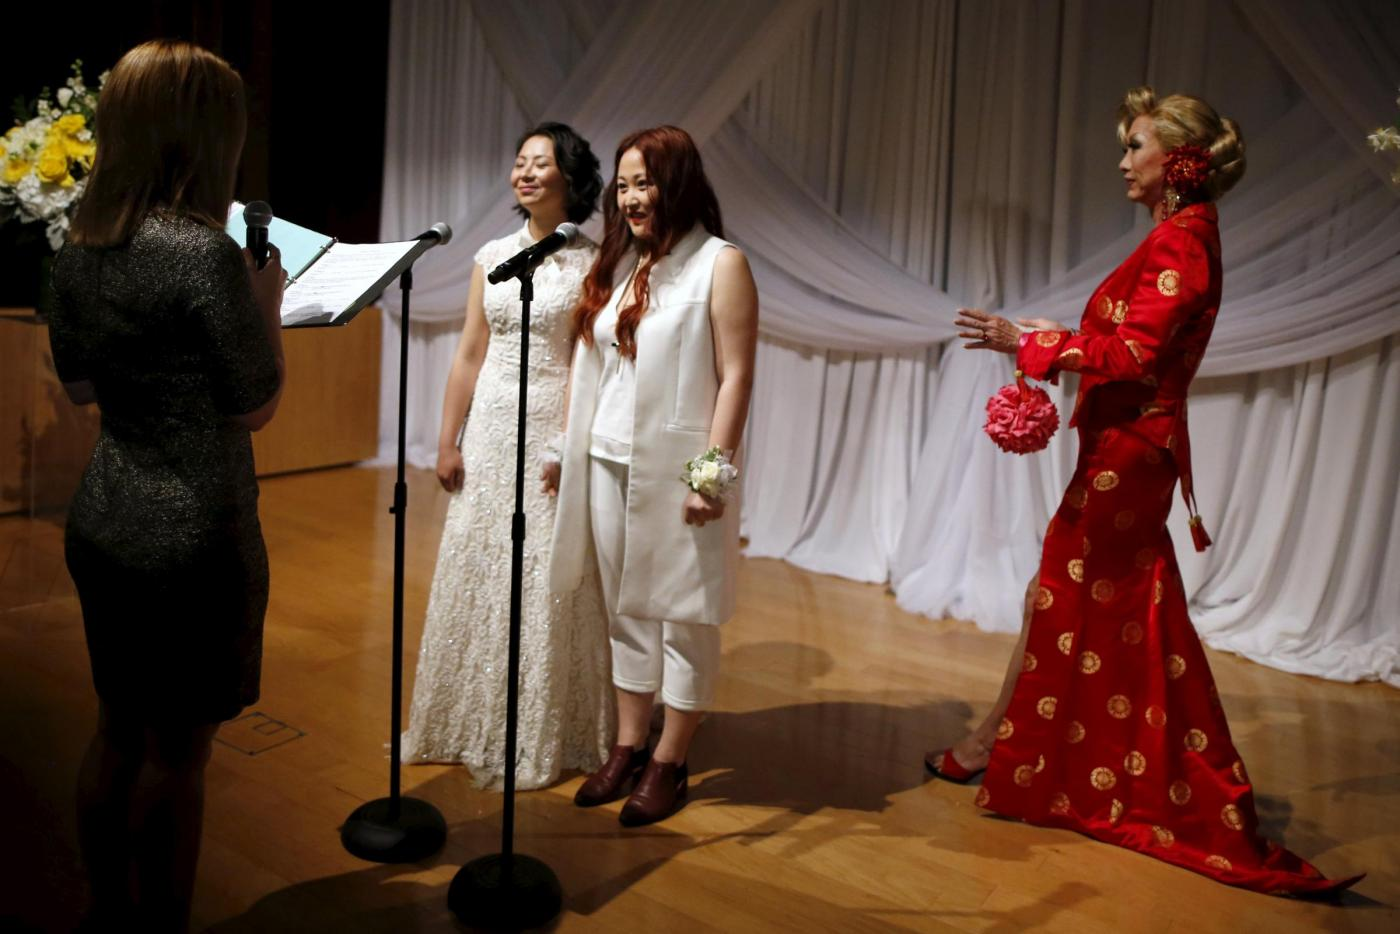 Sette coppie omosessuali cinesi si sposano a Los Angeles12